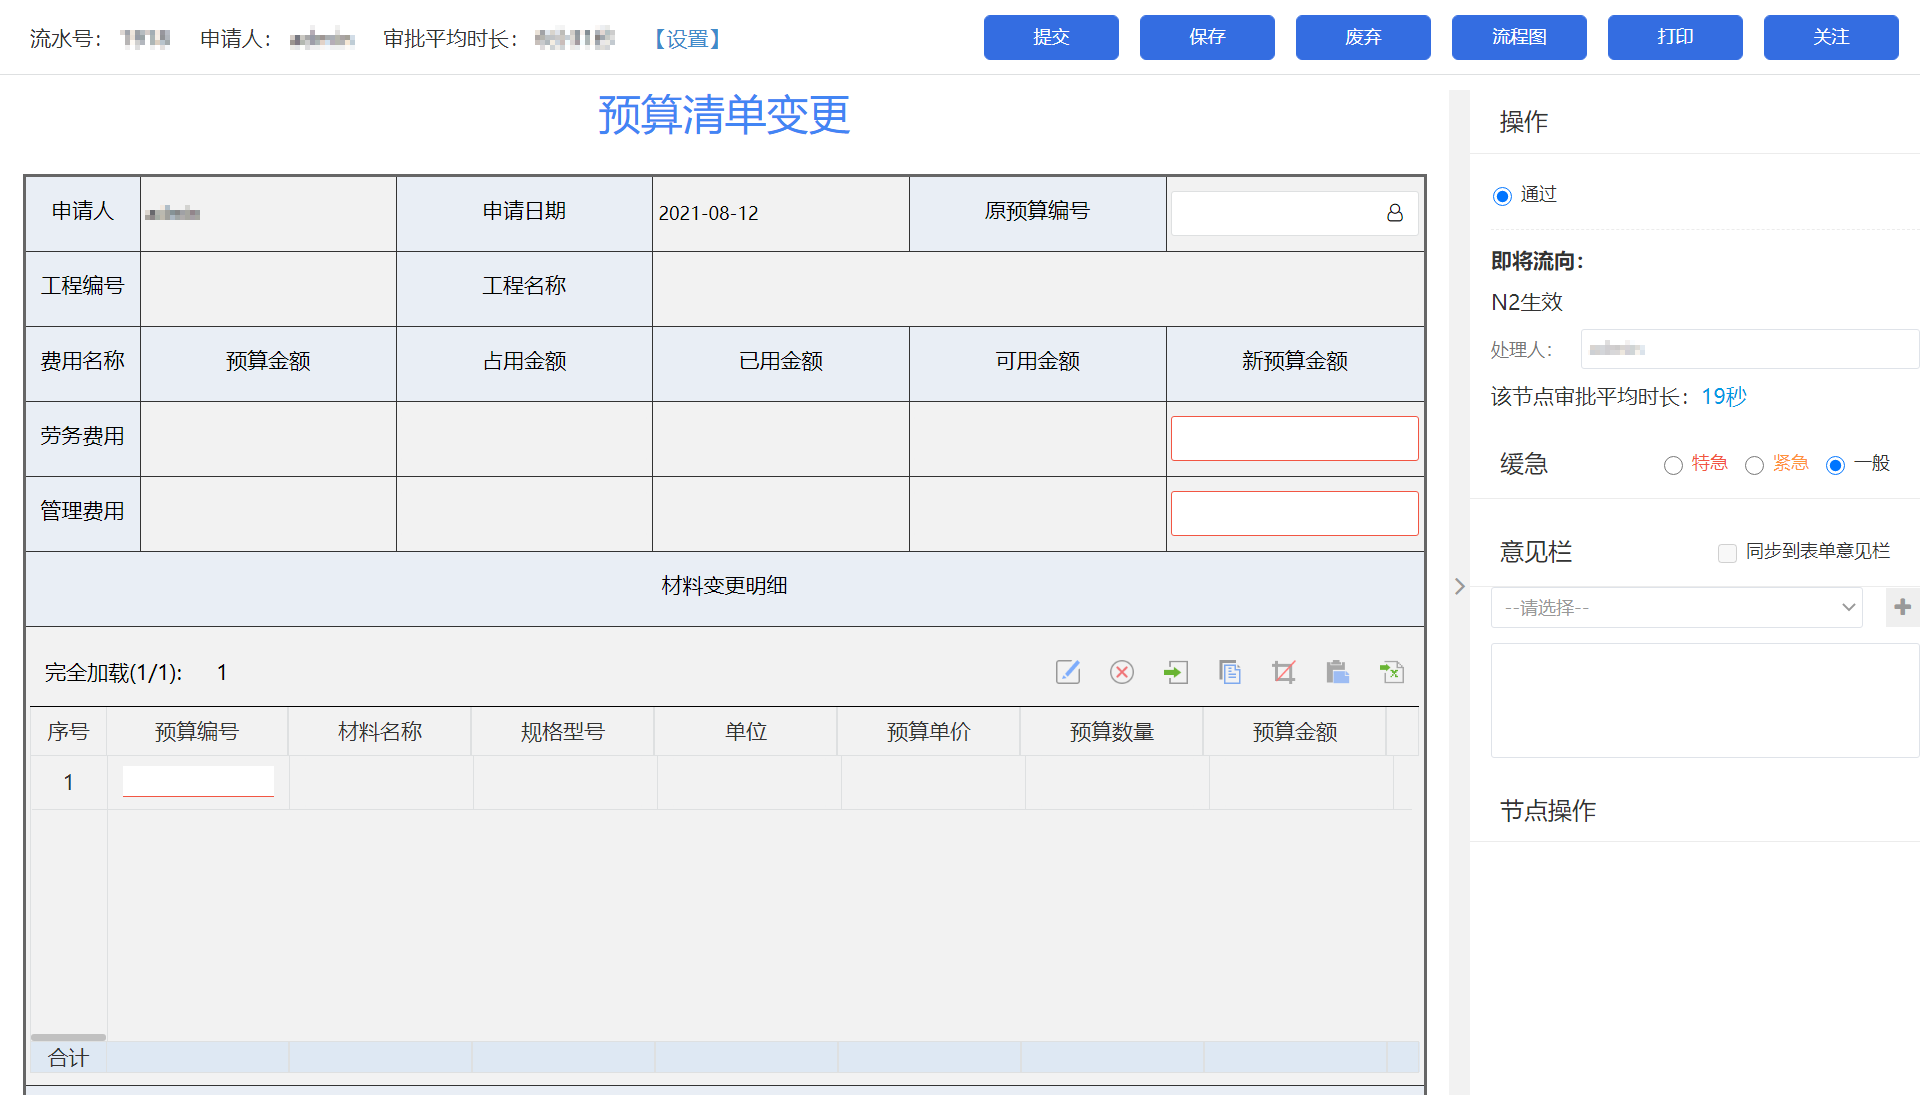 D:\Desktop-0206\案例\案例2021\耀华园林\流程处理-预算变更.png